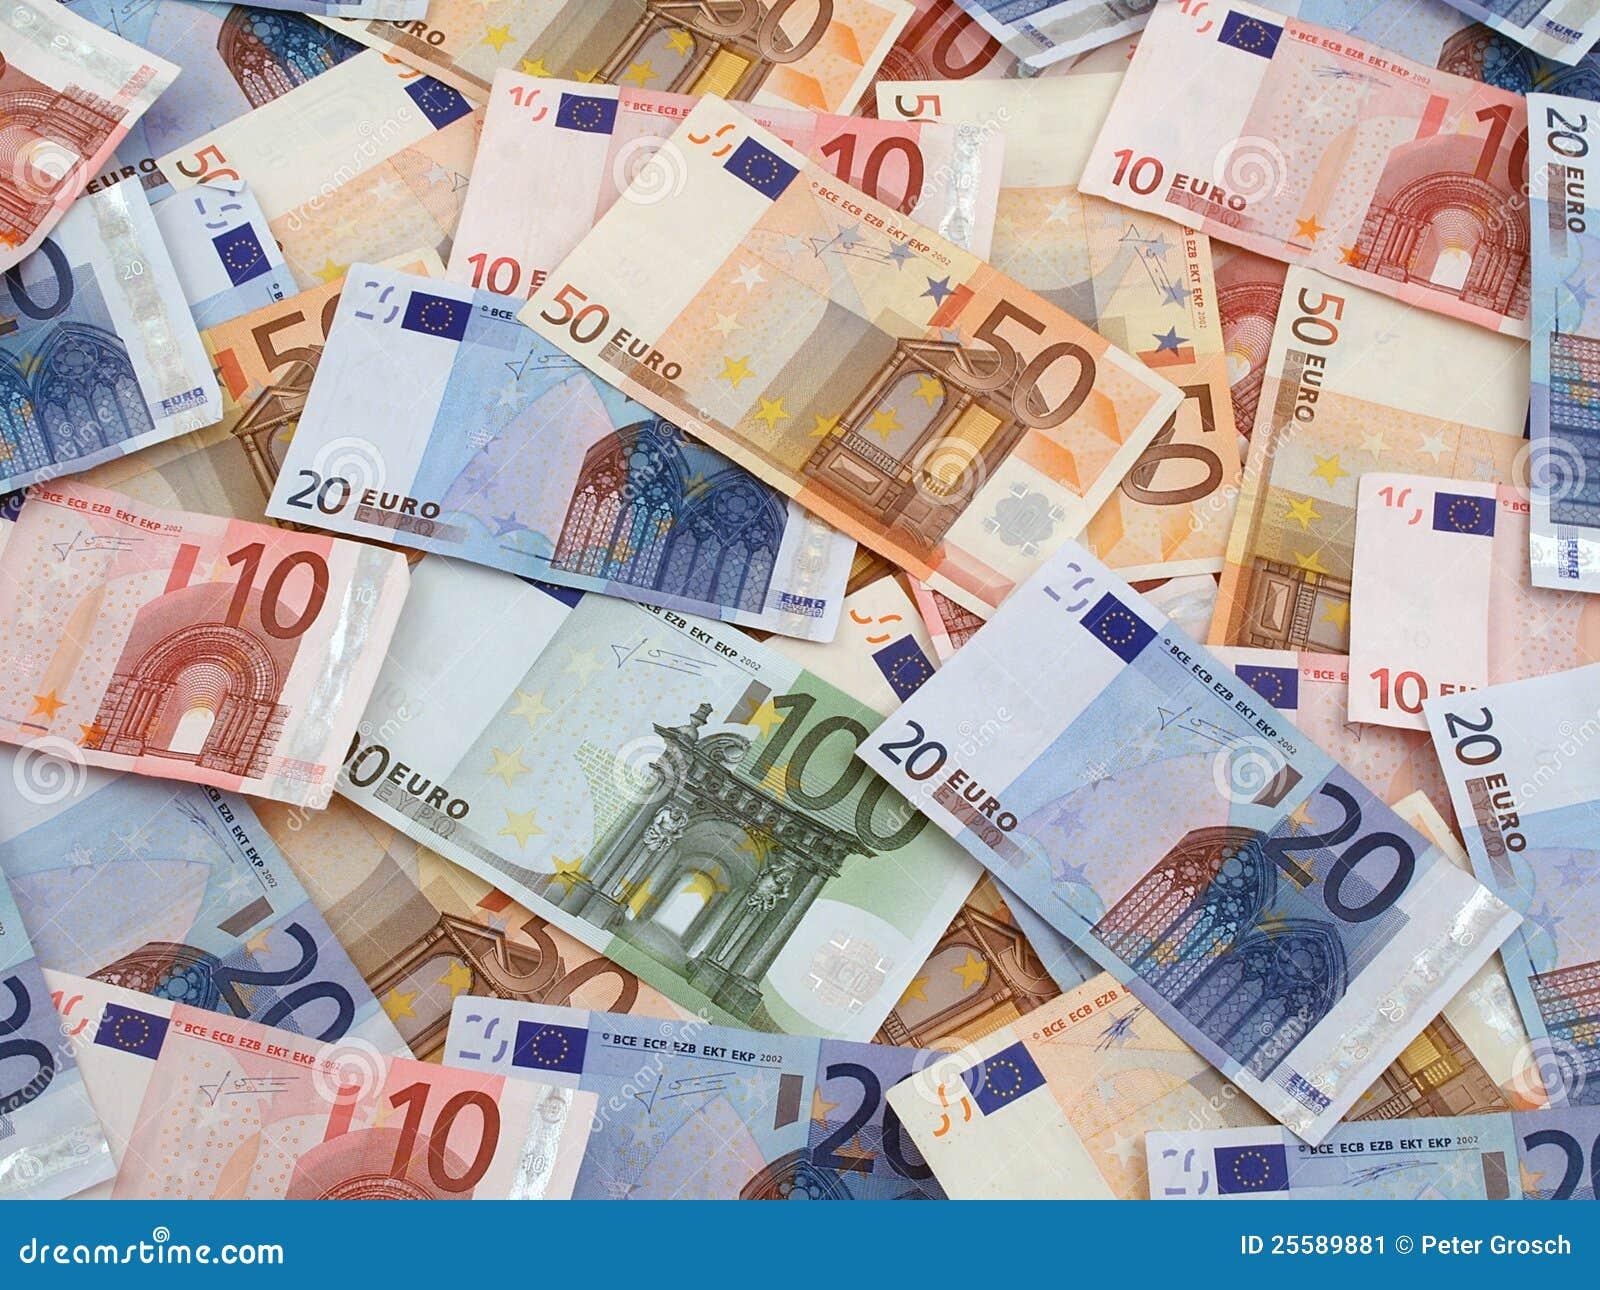 Sell euros